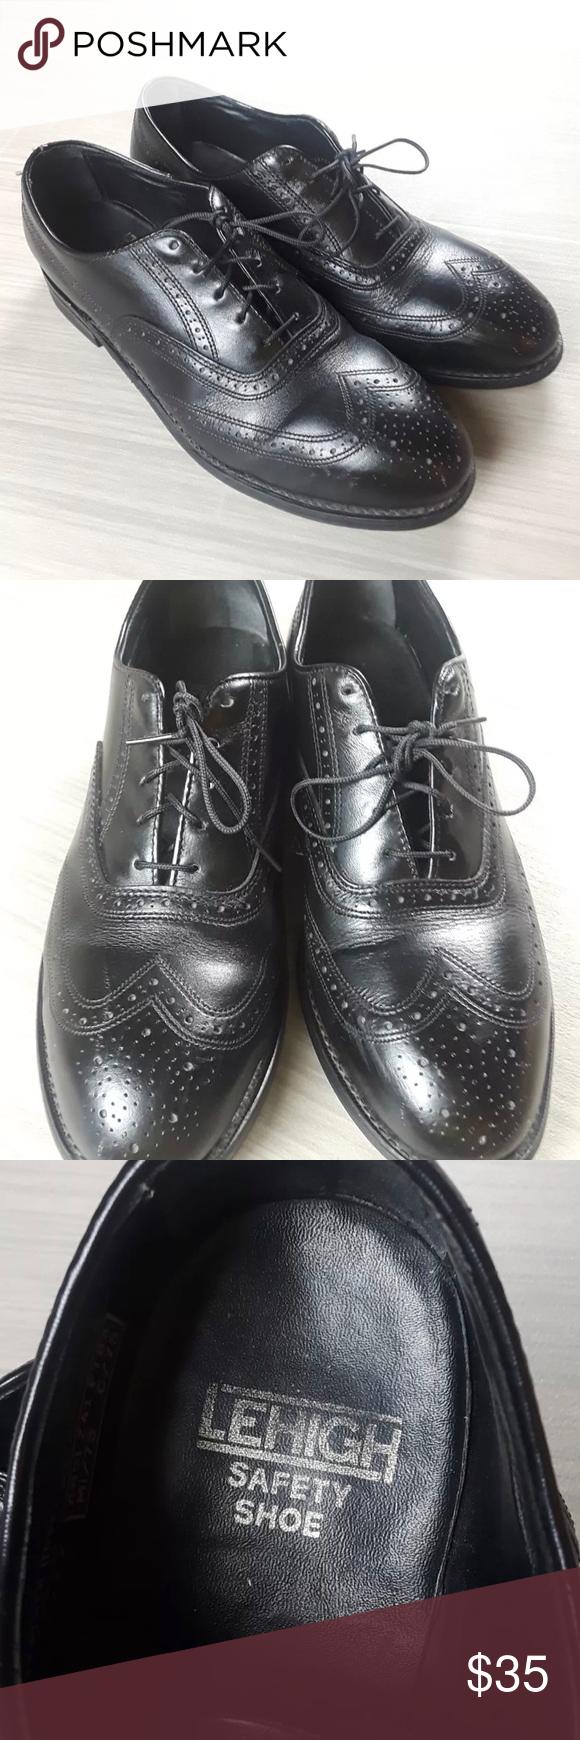 Lehigh Safety Toe Black Leather Oxfords Men's 9.5D Lehigh